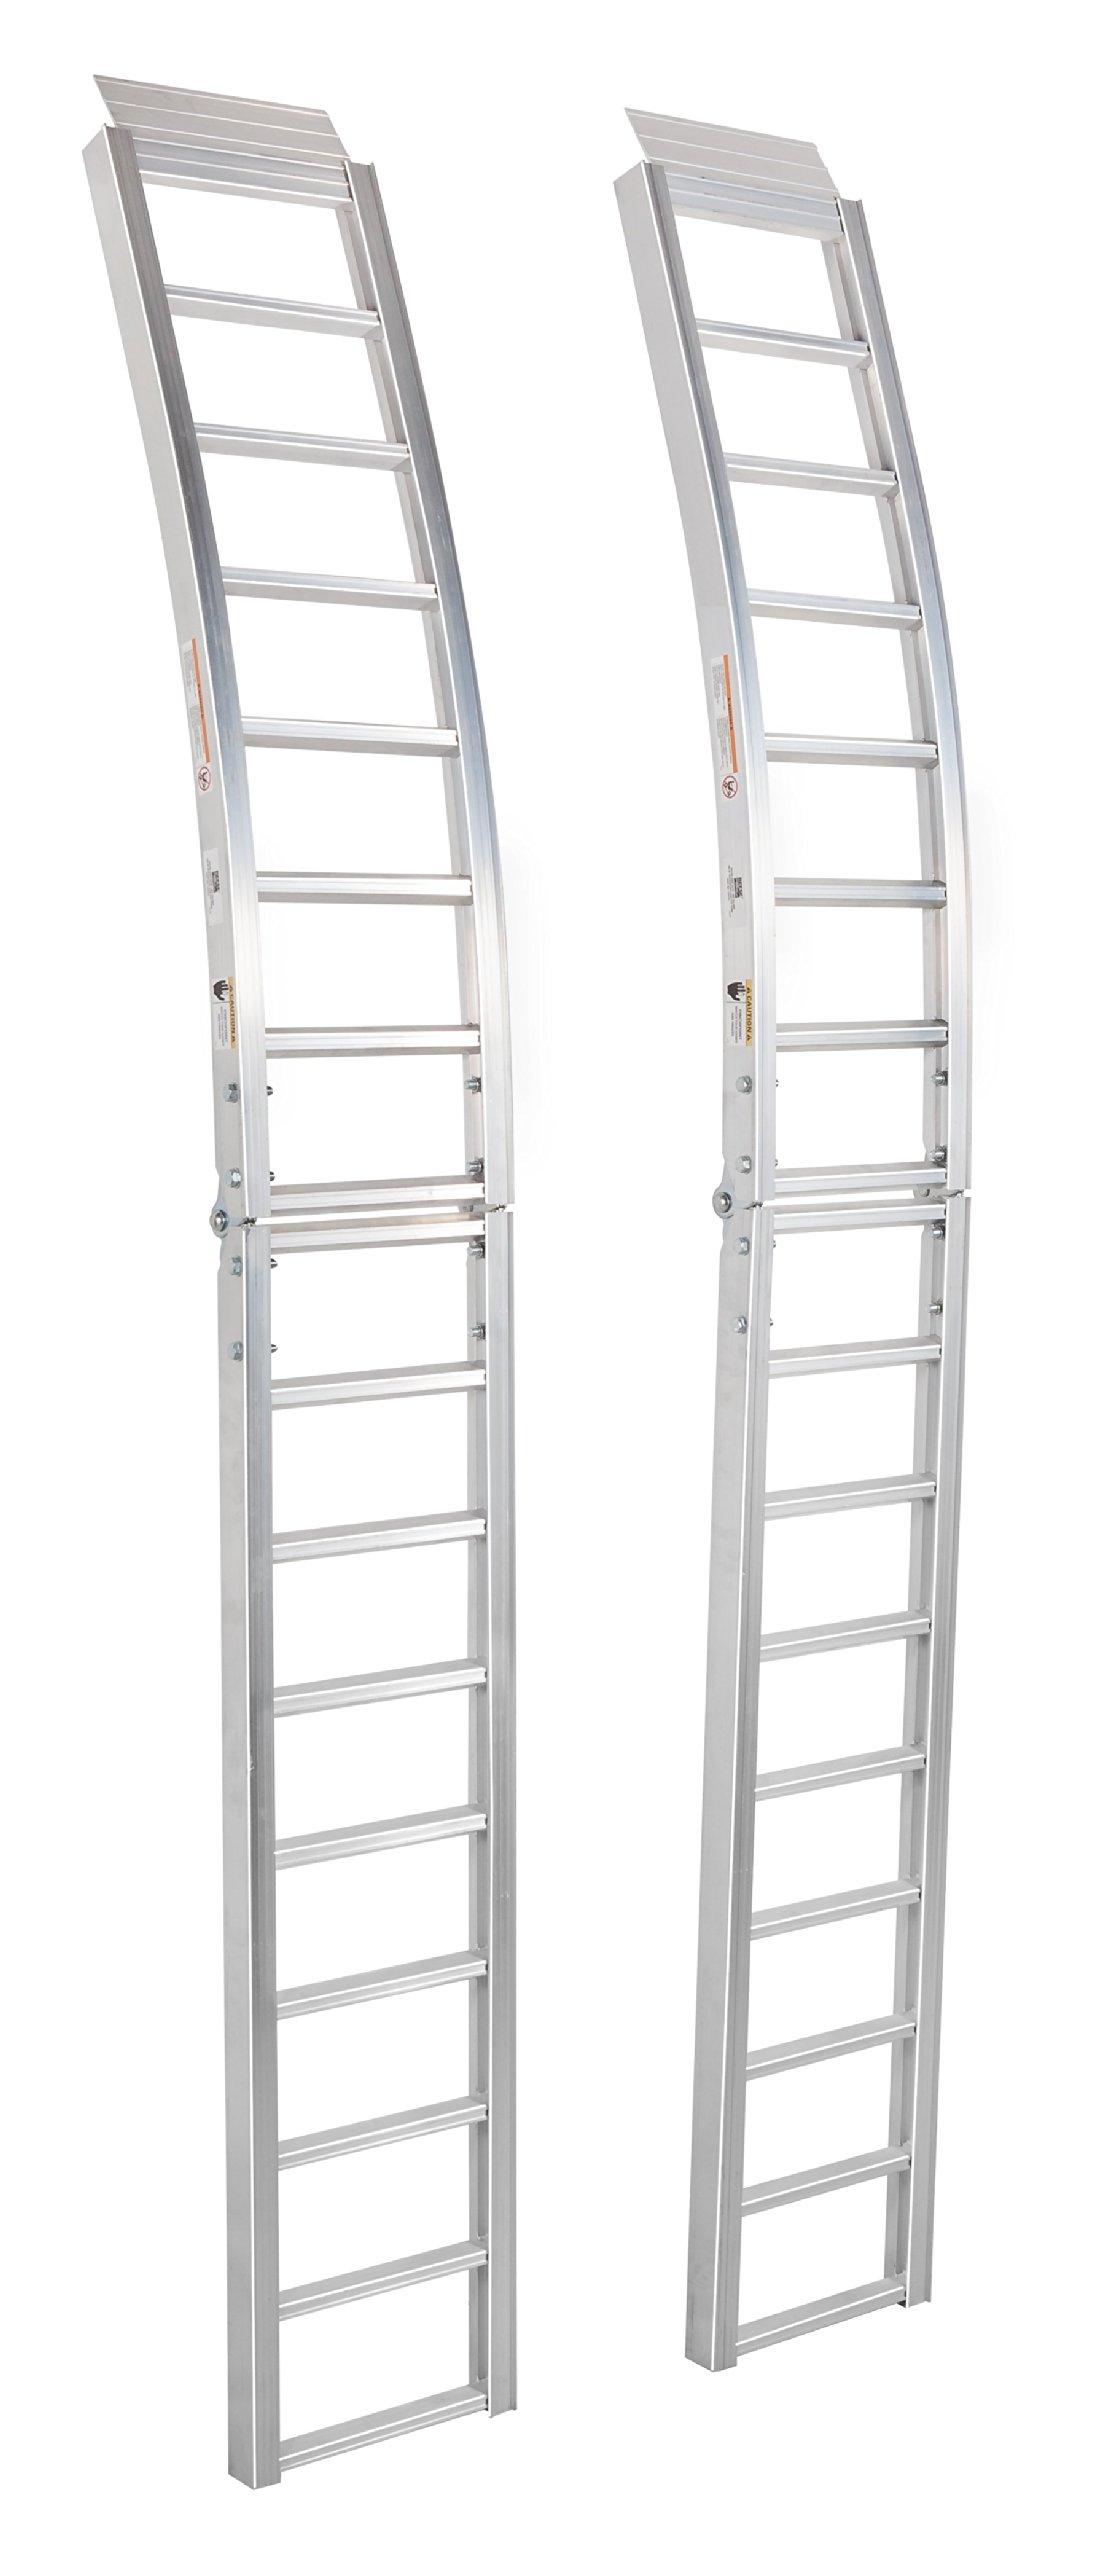 Highland (1123100) 90'' Aluminum Arched Center Fold Loading Ramp - Pair